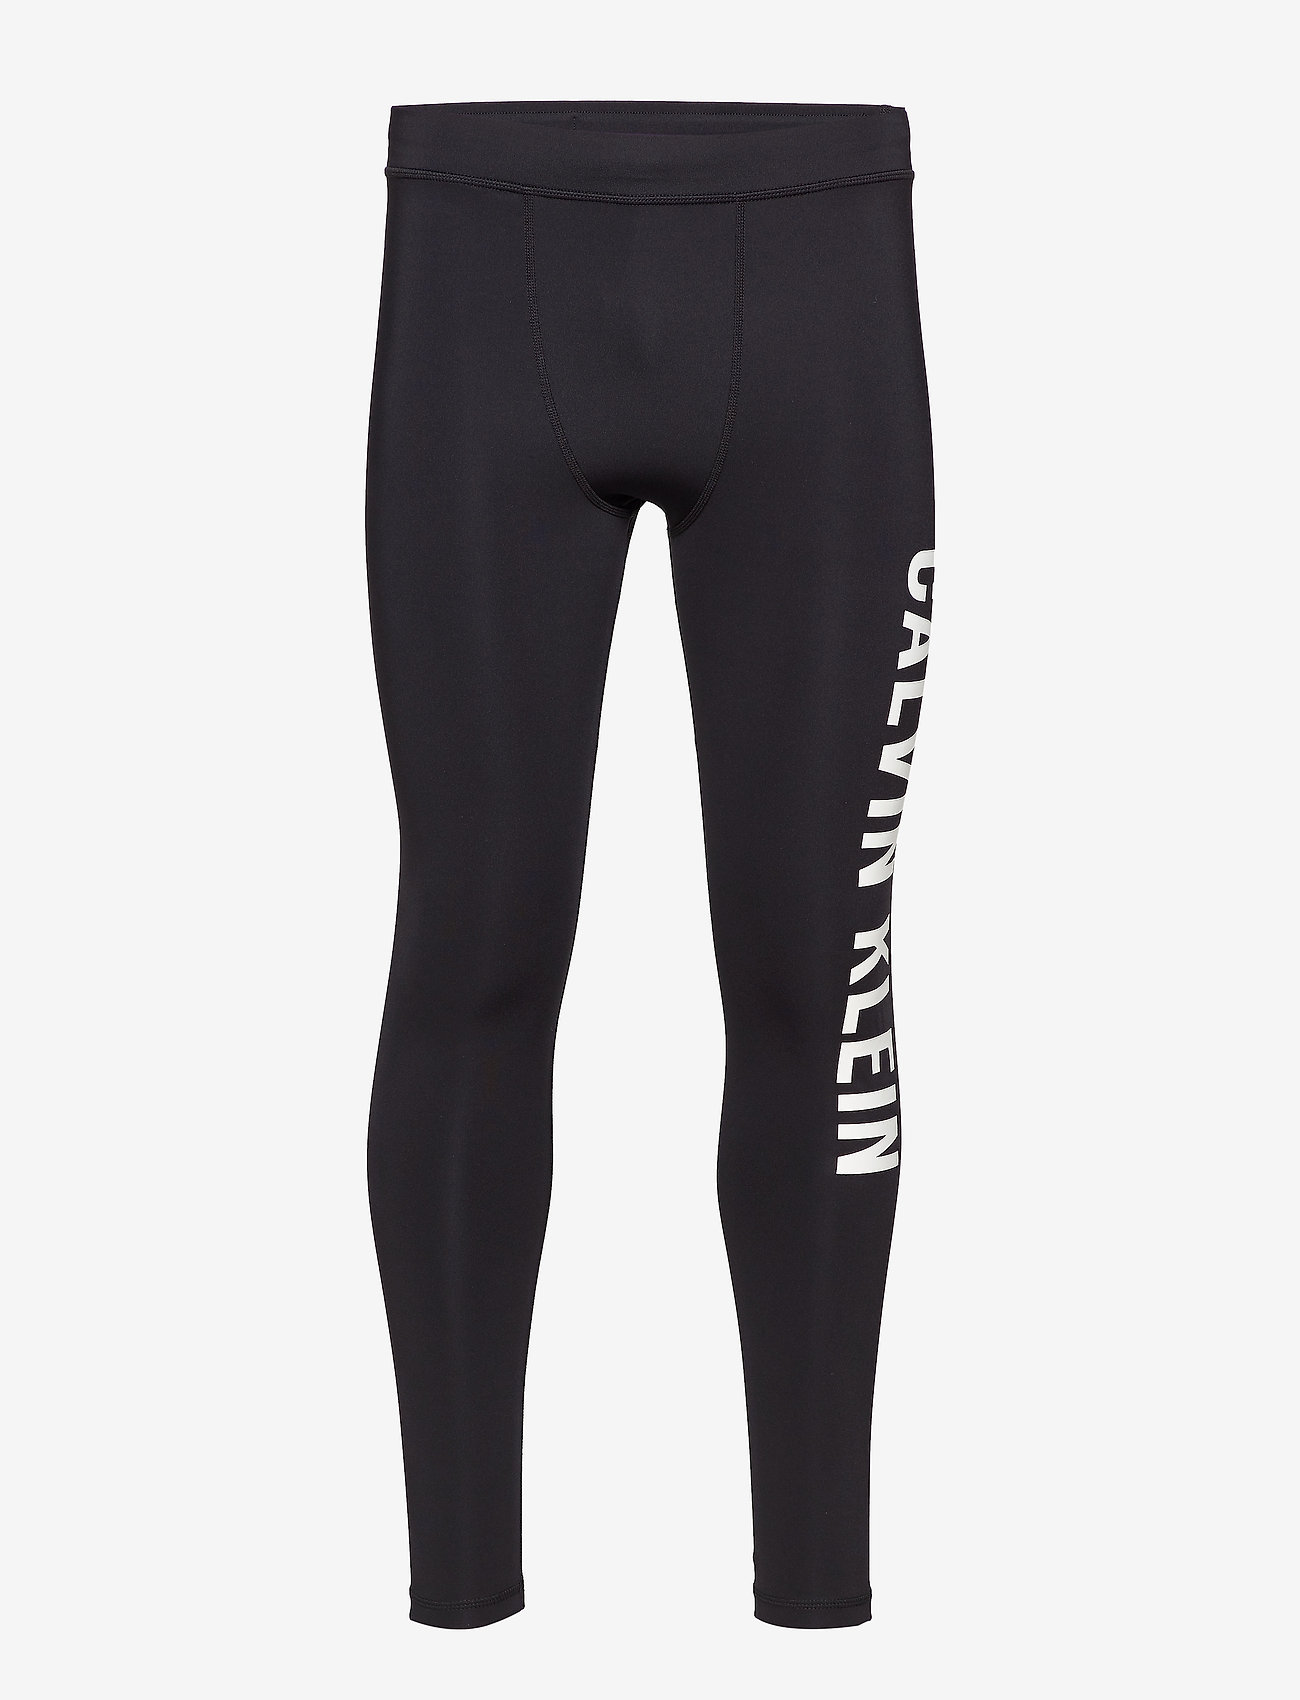 Calvin Klein Performance - FULL LENGTH TIGHT LO - sportleggings - ck black - 0